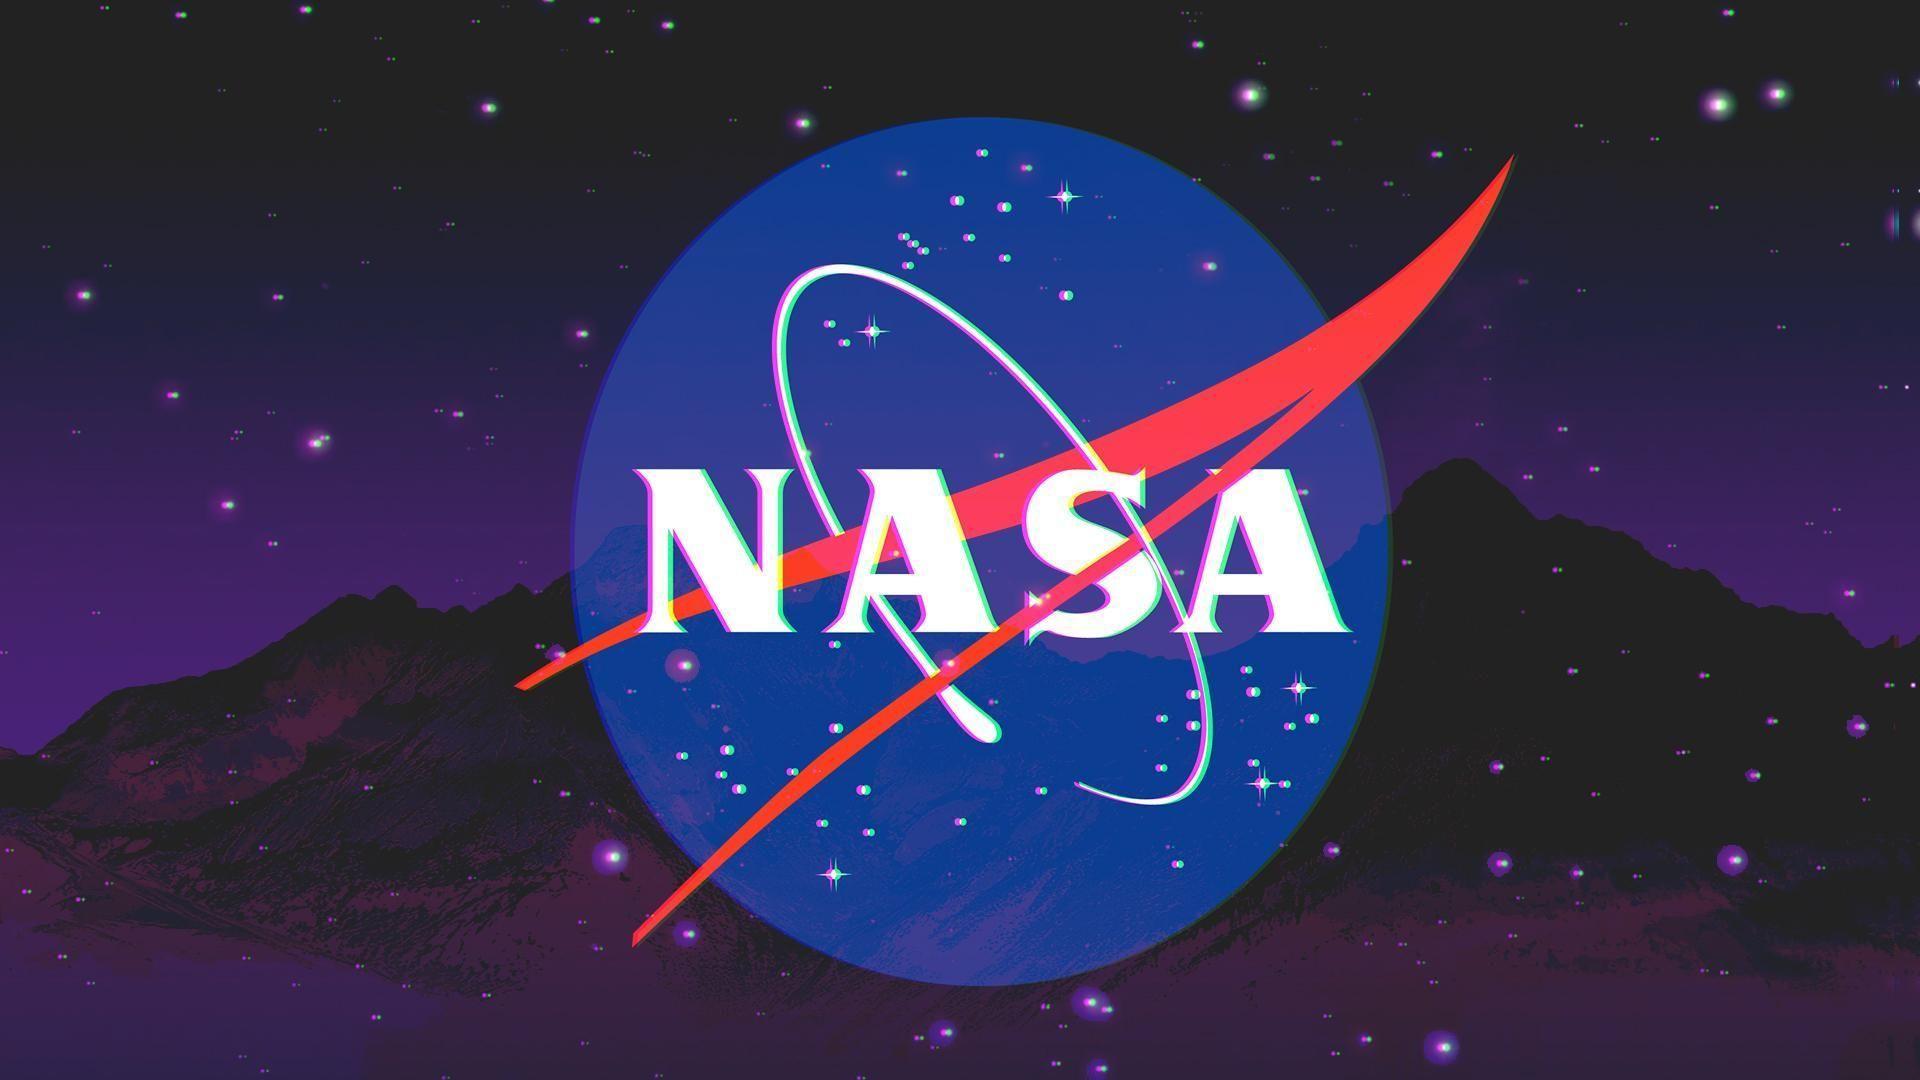 Nasa Logo Wallpapers Top Free Nasa Logo Backgrounds